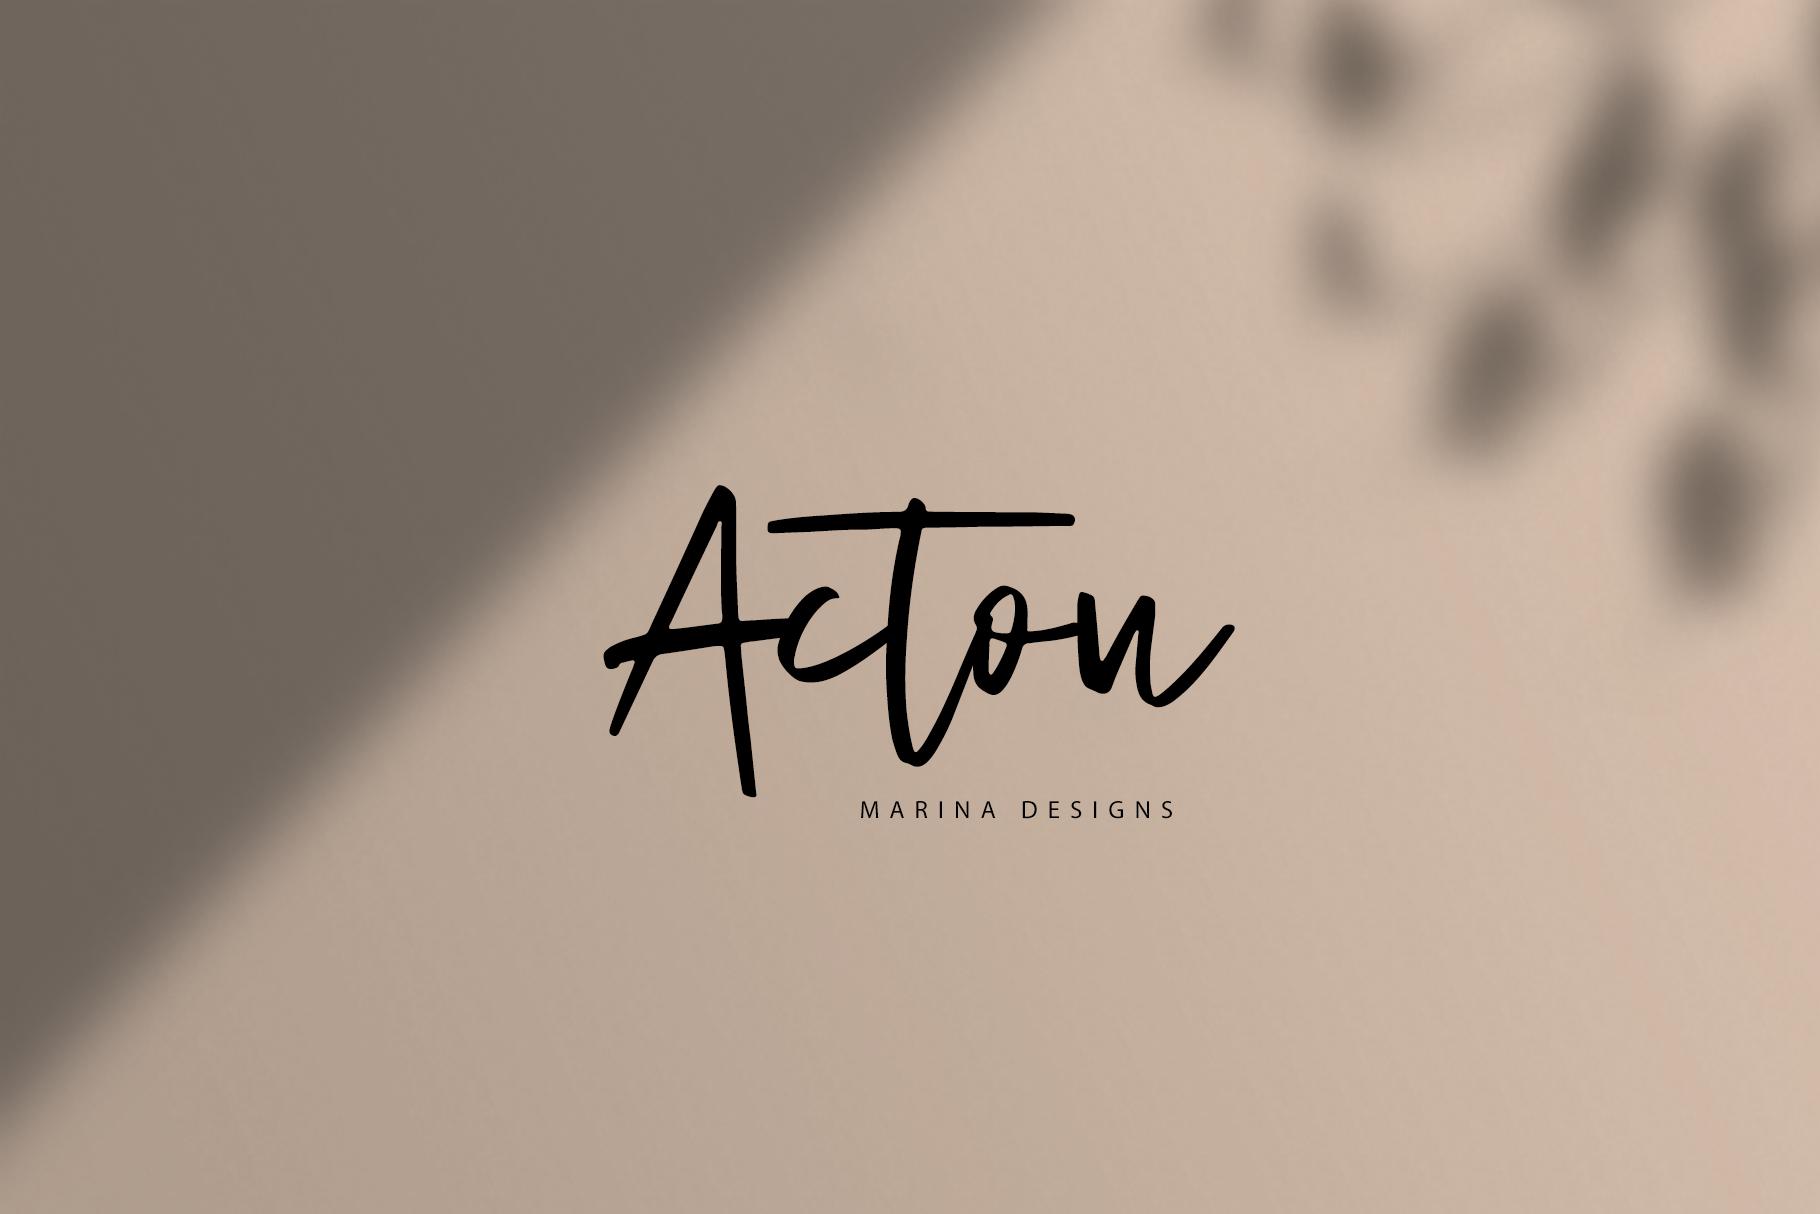 Acton example image 1